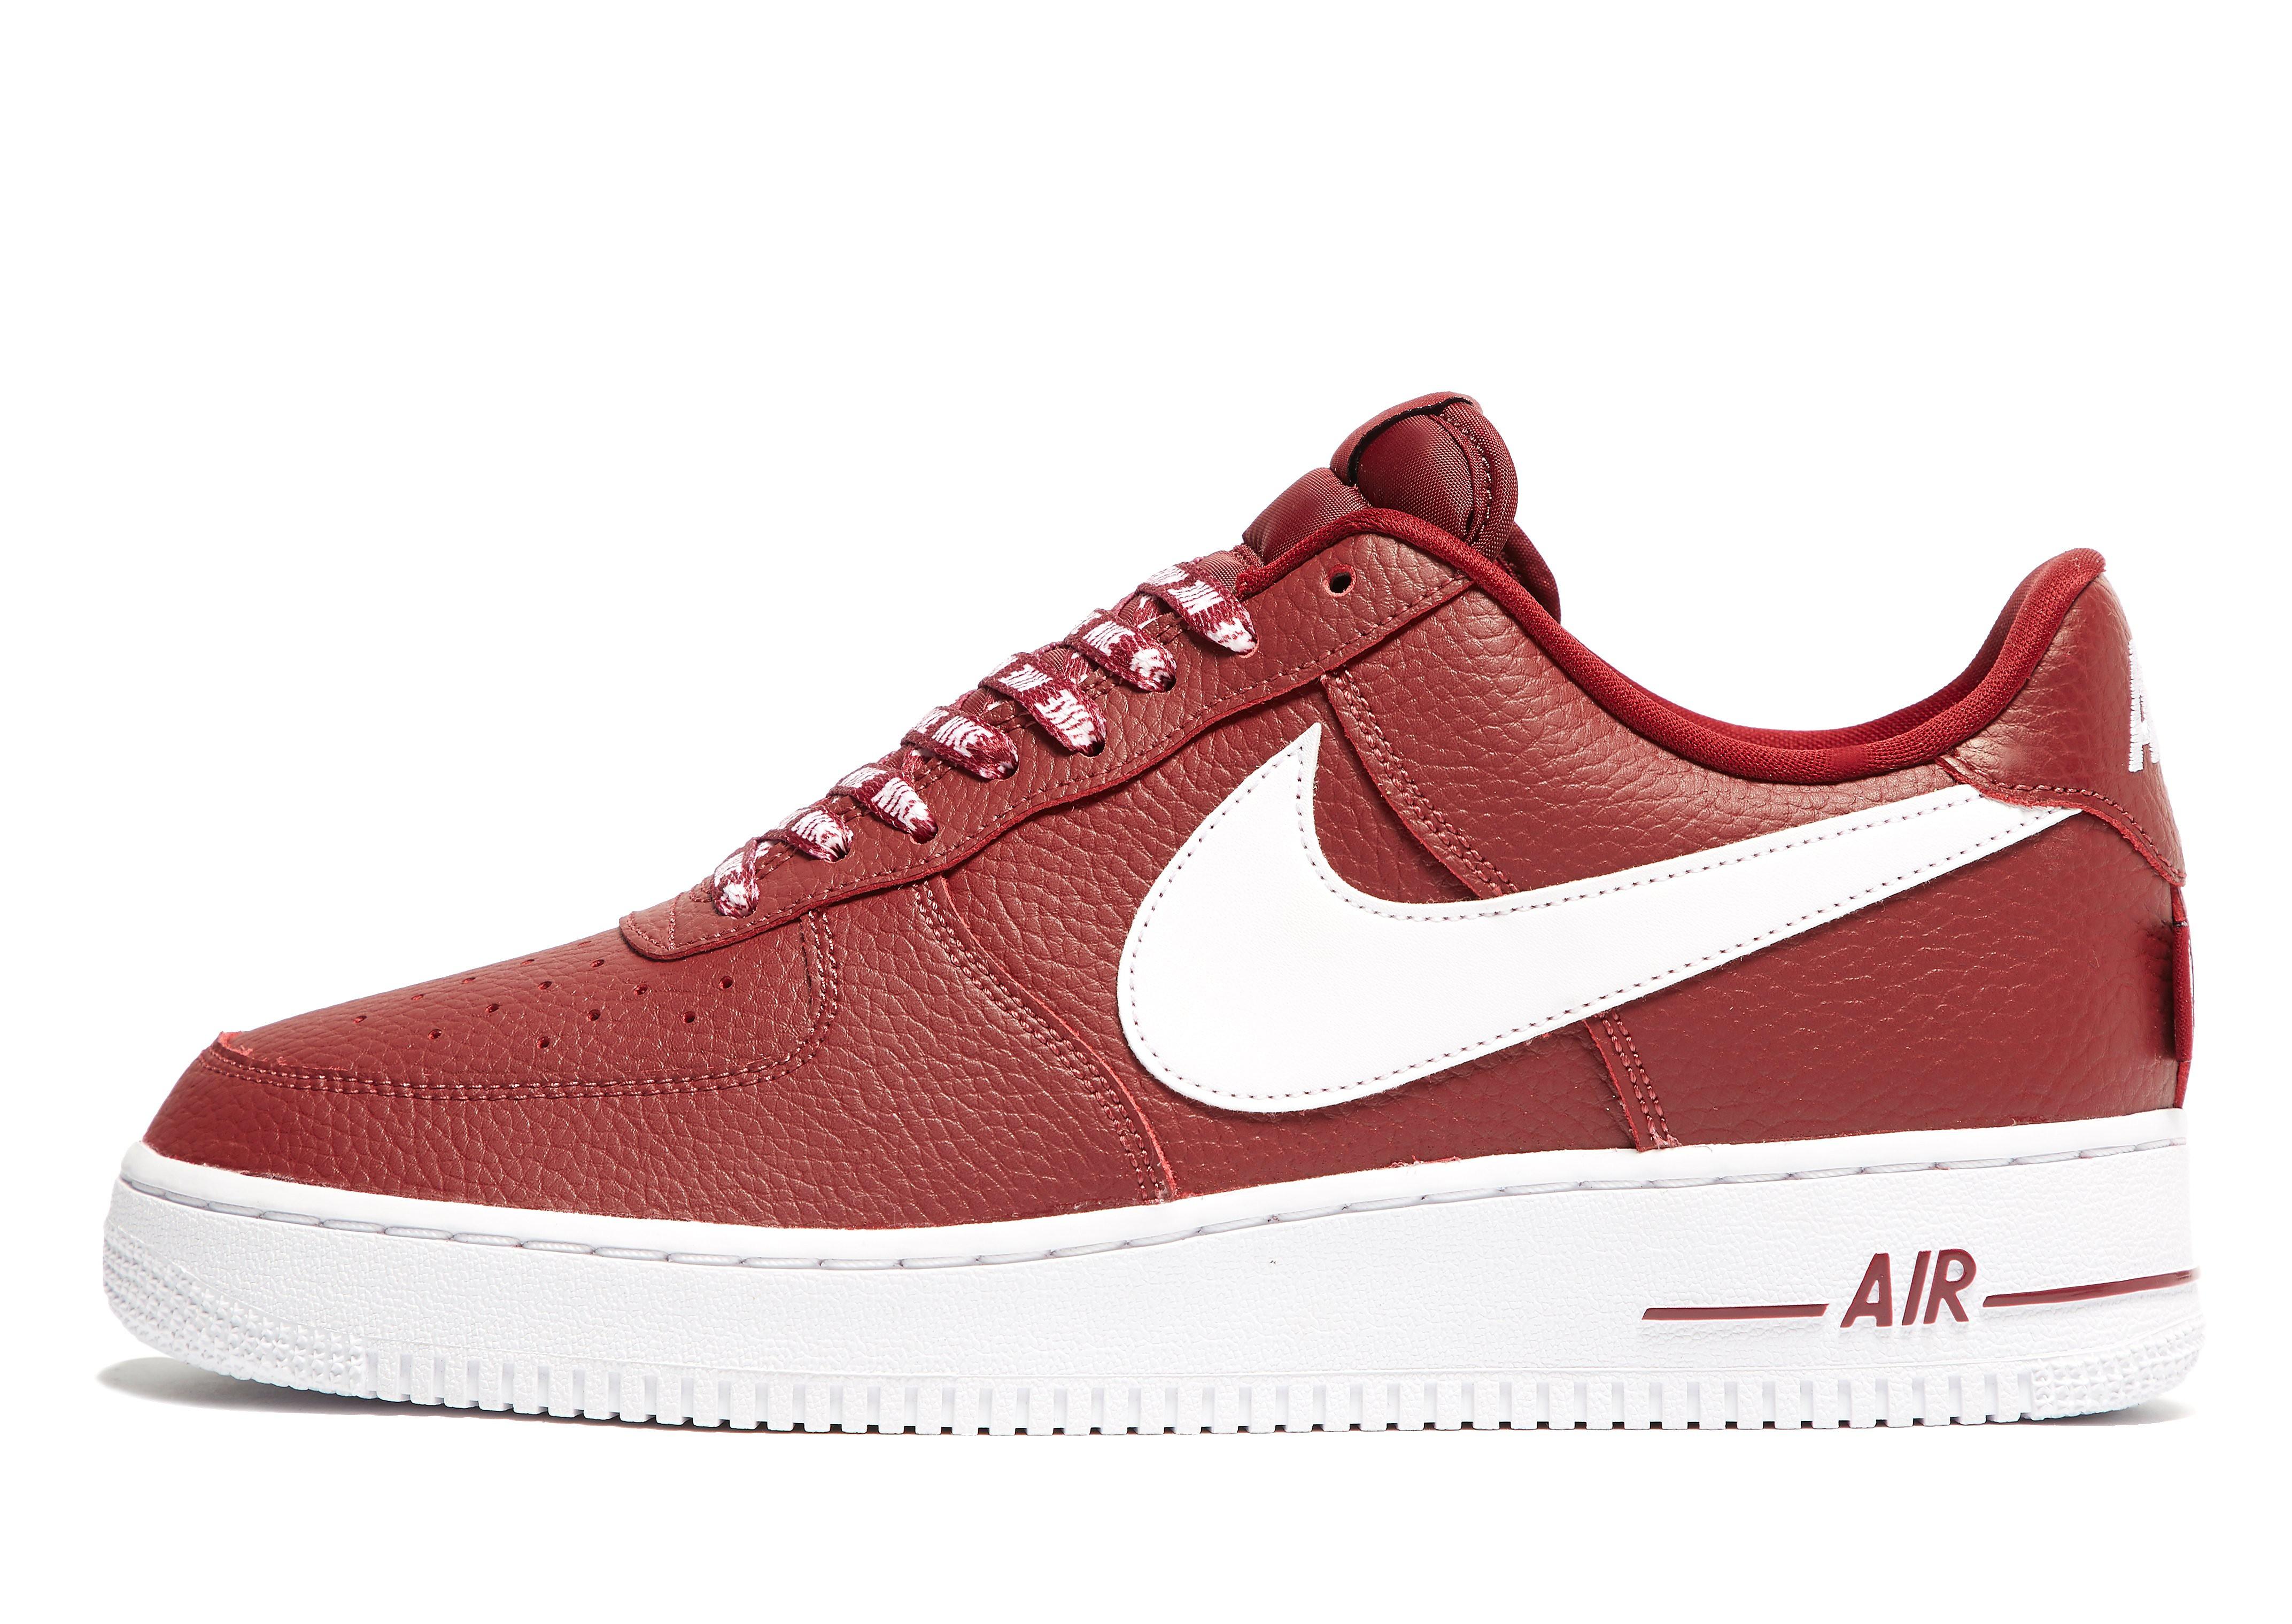 Nike Air Force 1 '07 'NBA' Homme